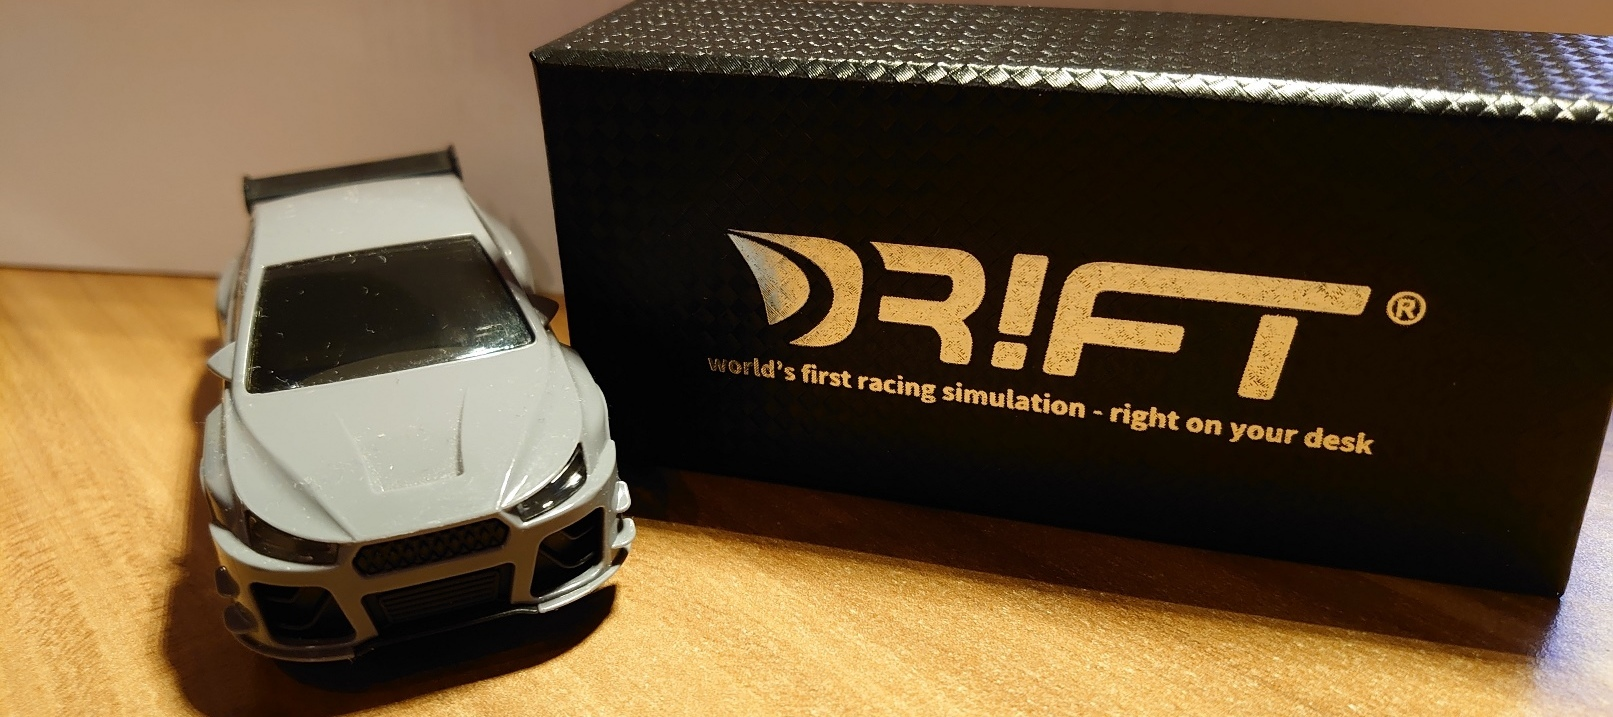 Testbericht: Sturmkind Dr!ft Racer